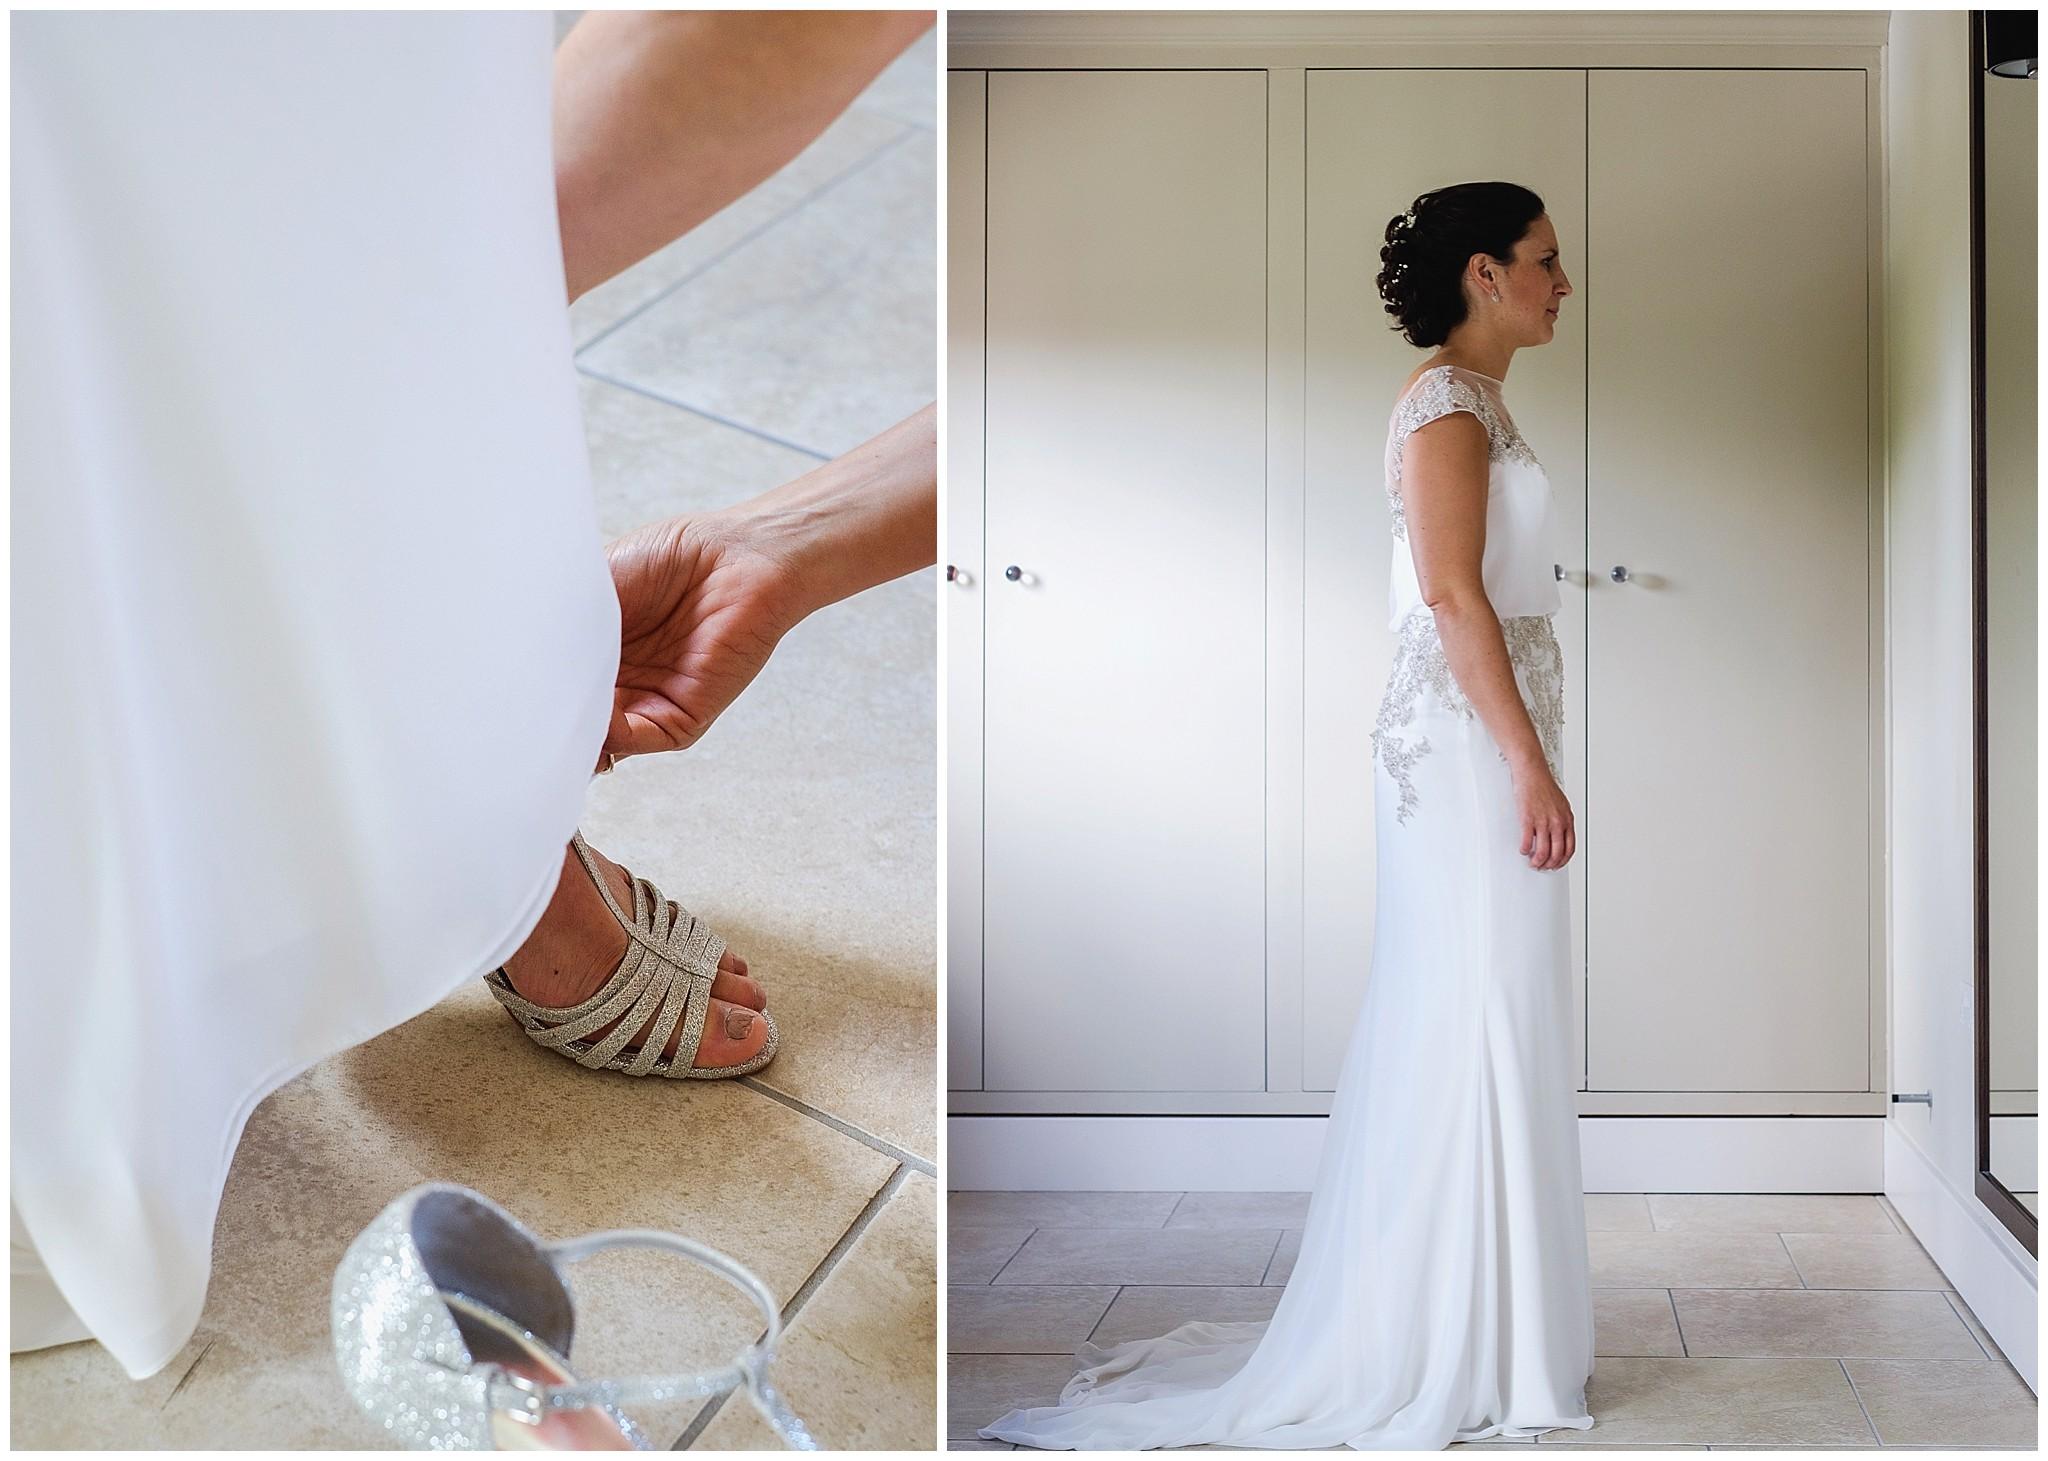 bride looks in the mirror